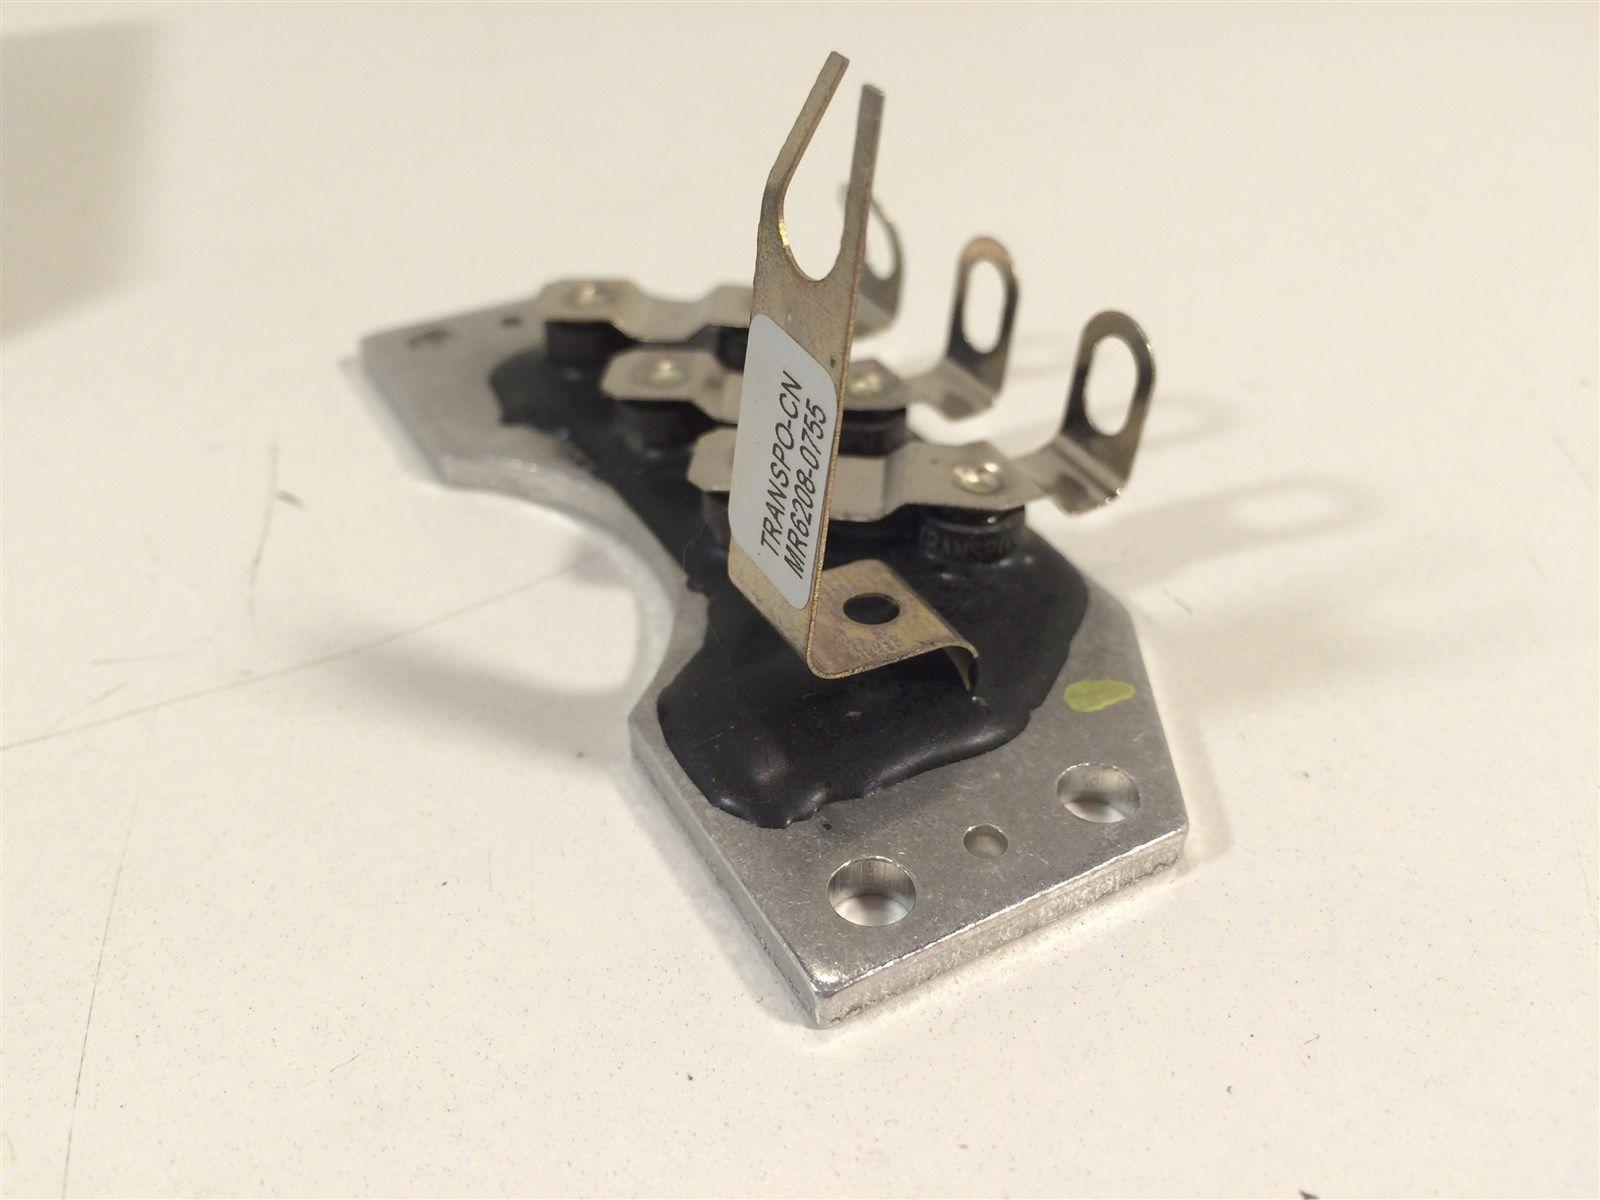 Transpo MR6208 J&N 172-16025 LP Voltage Rectifier 101-207 Motorola